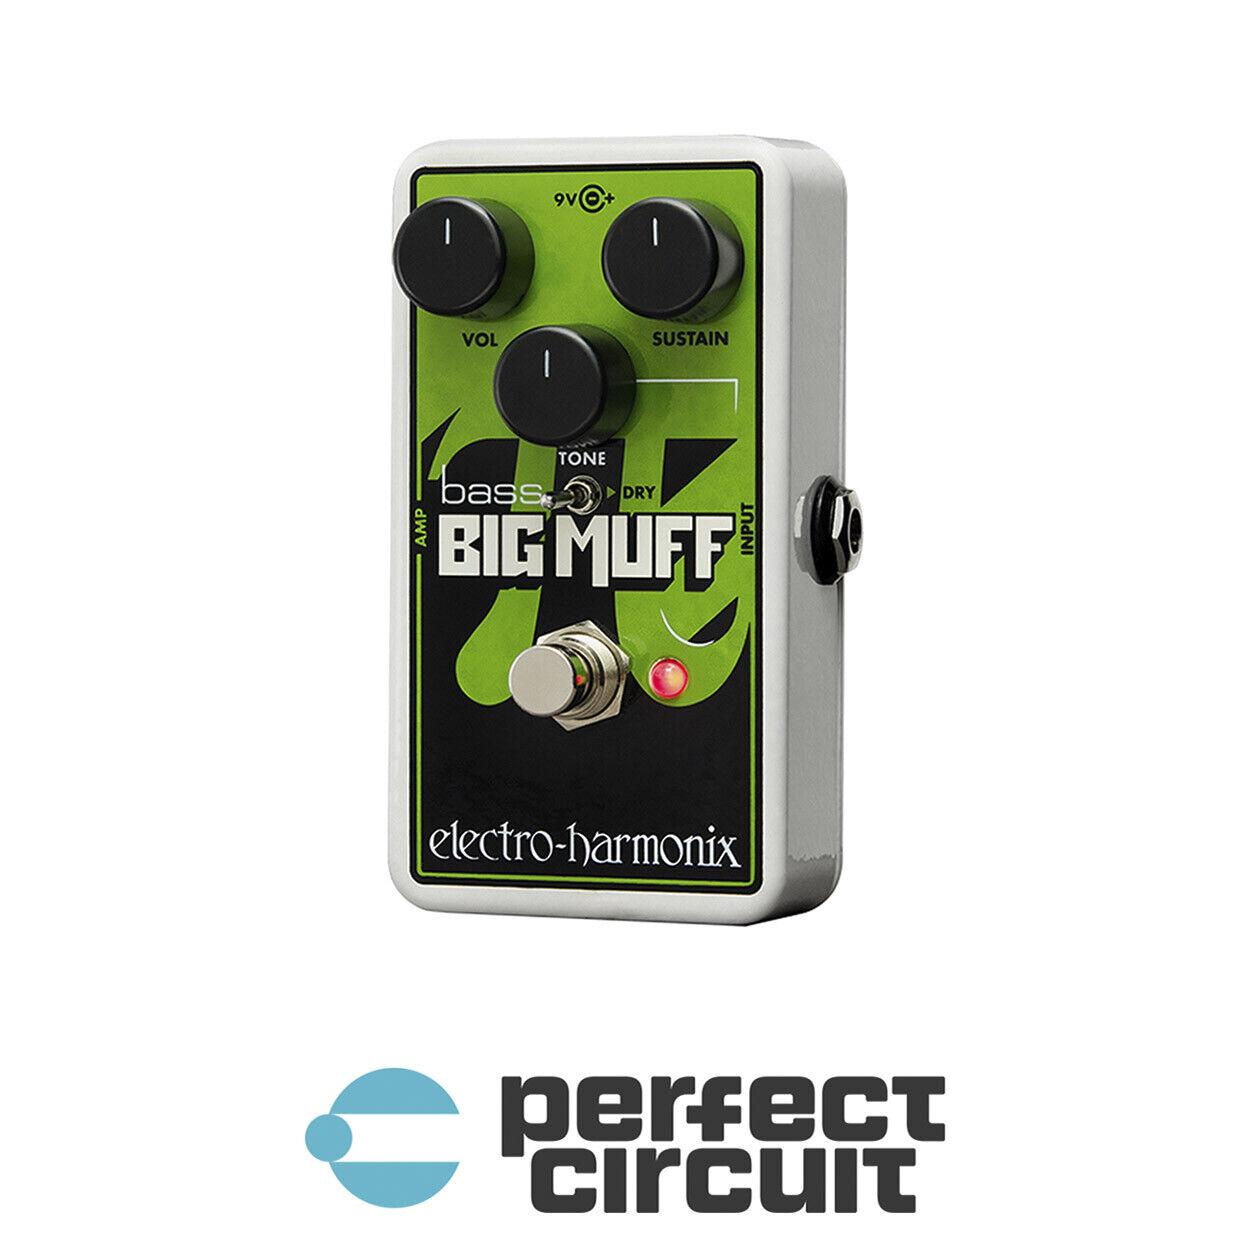 Electro-Harmonix Nano Bass Big Muff Pi Distortion PEDAL NEW - PERFECT CIRCUIT